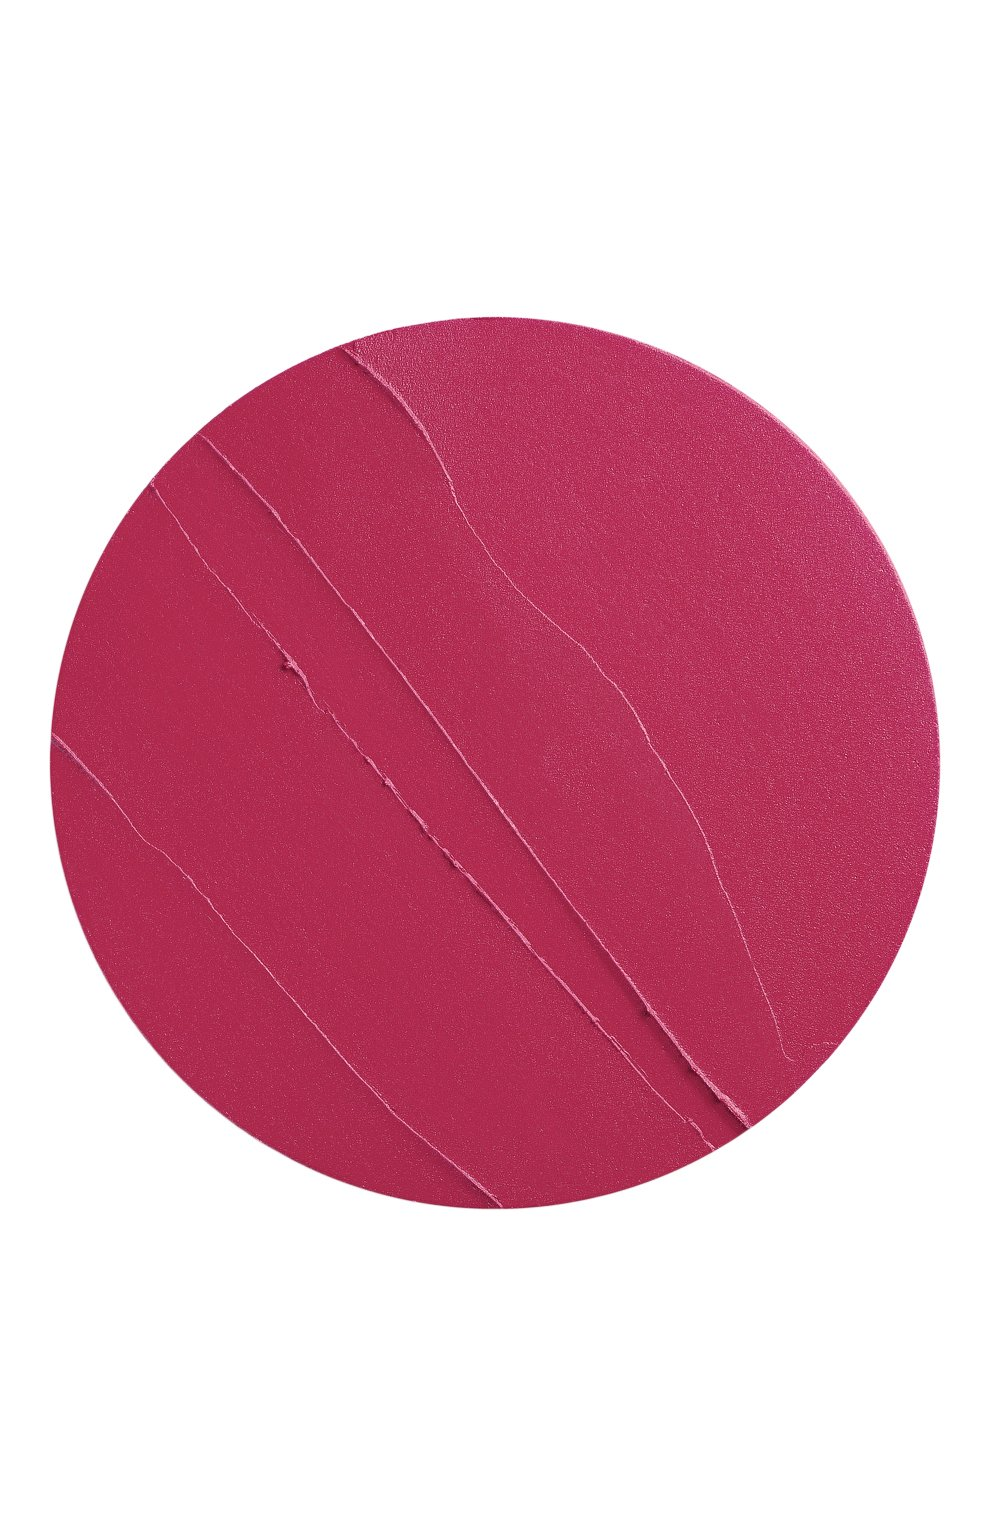 Женская матовая губная помада rouge hermès, rose velours HERMÈS бесцветного цвета, арт. 60001MV078H   Фото 8